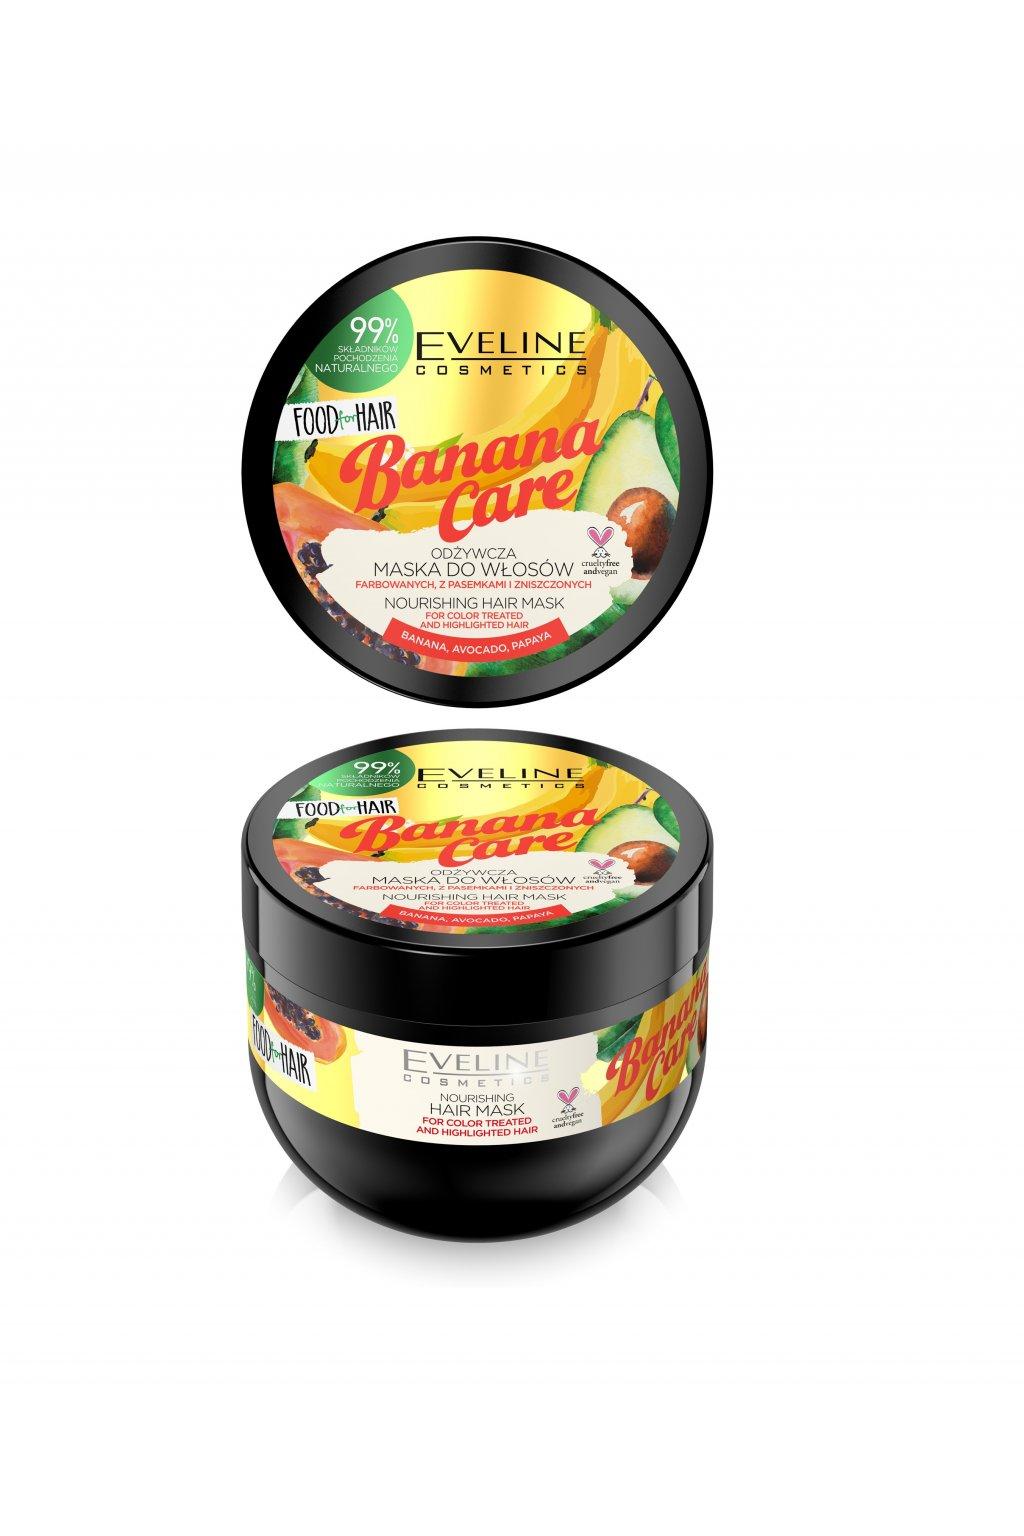 eveline cosmetics FOOD FOR HAIR BANANA CARE HAIR MASK 500ML